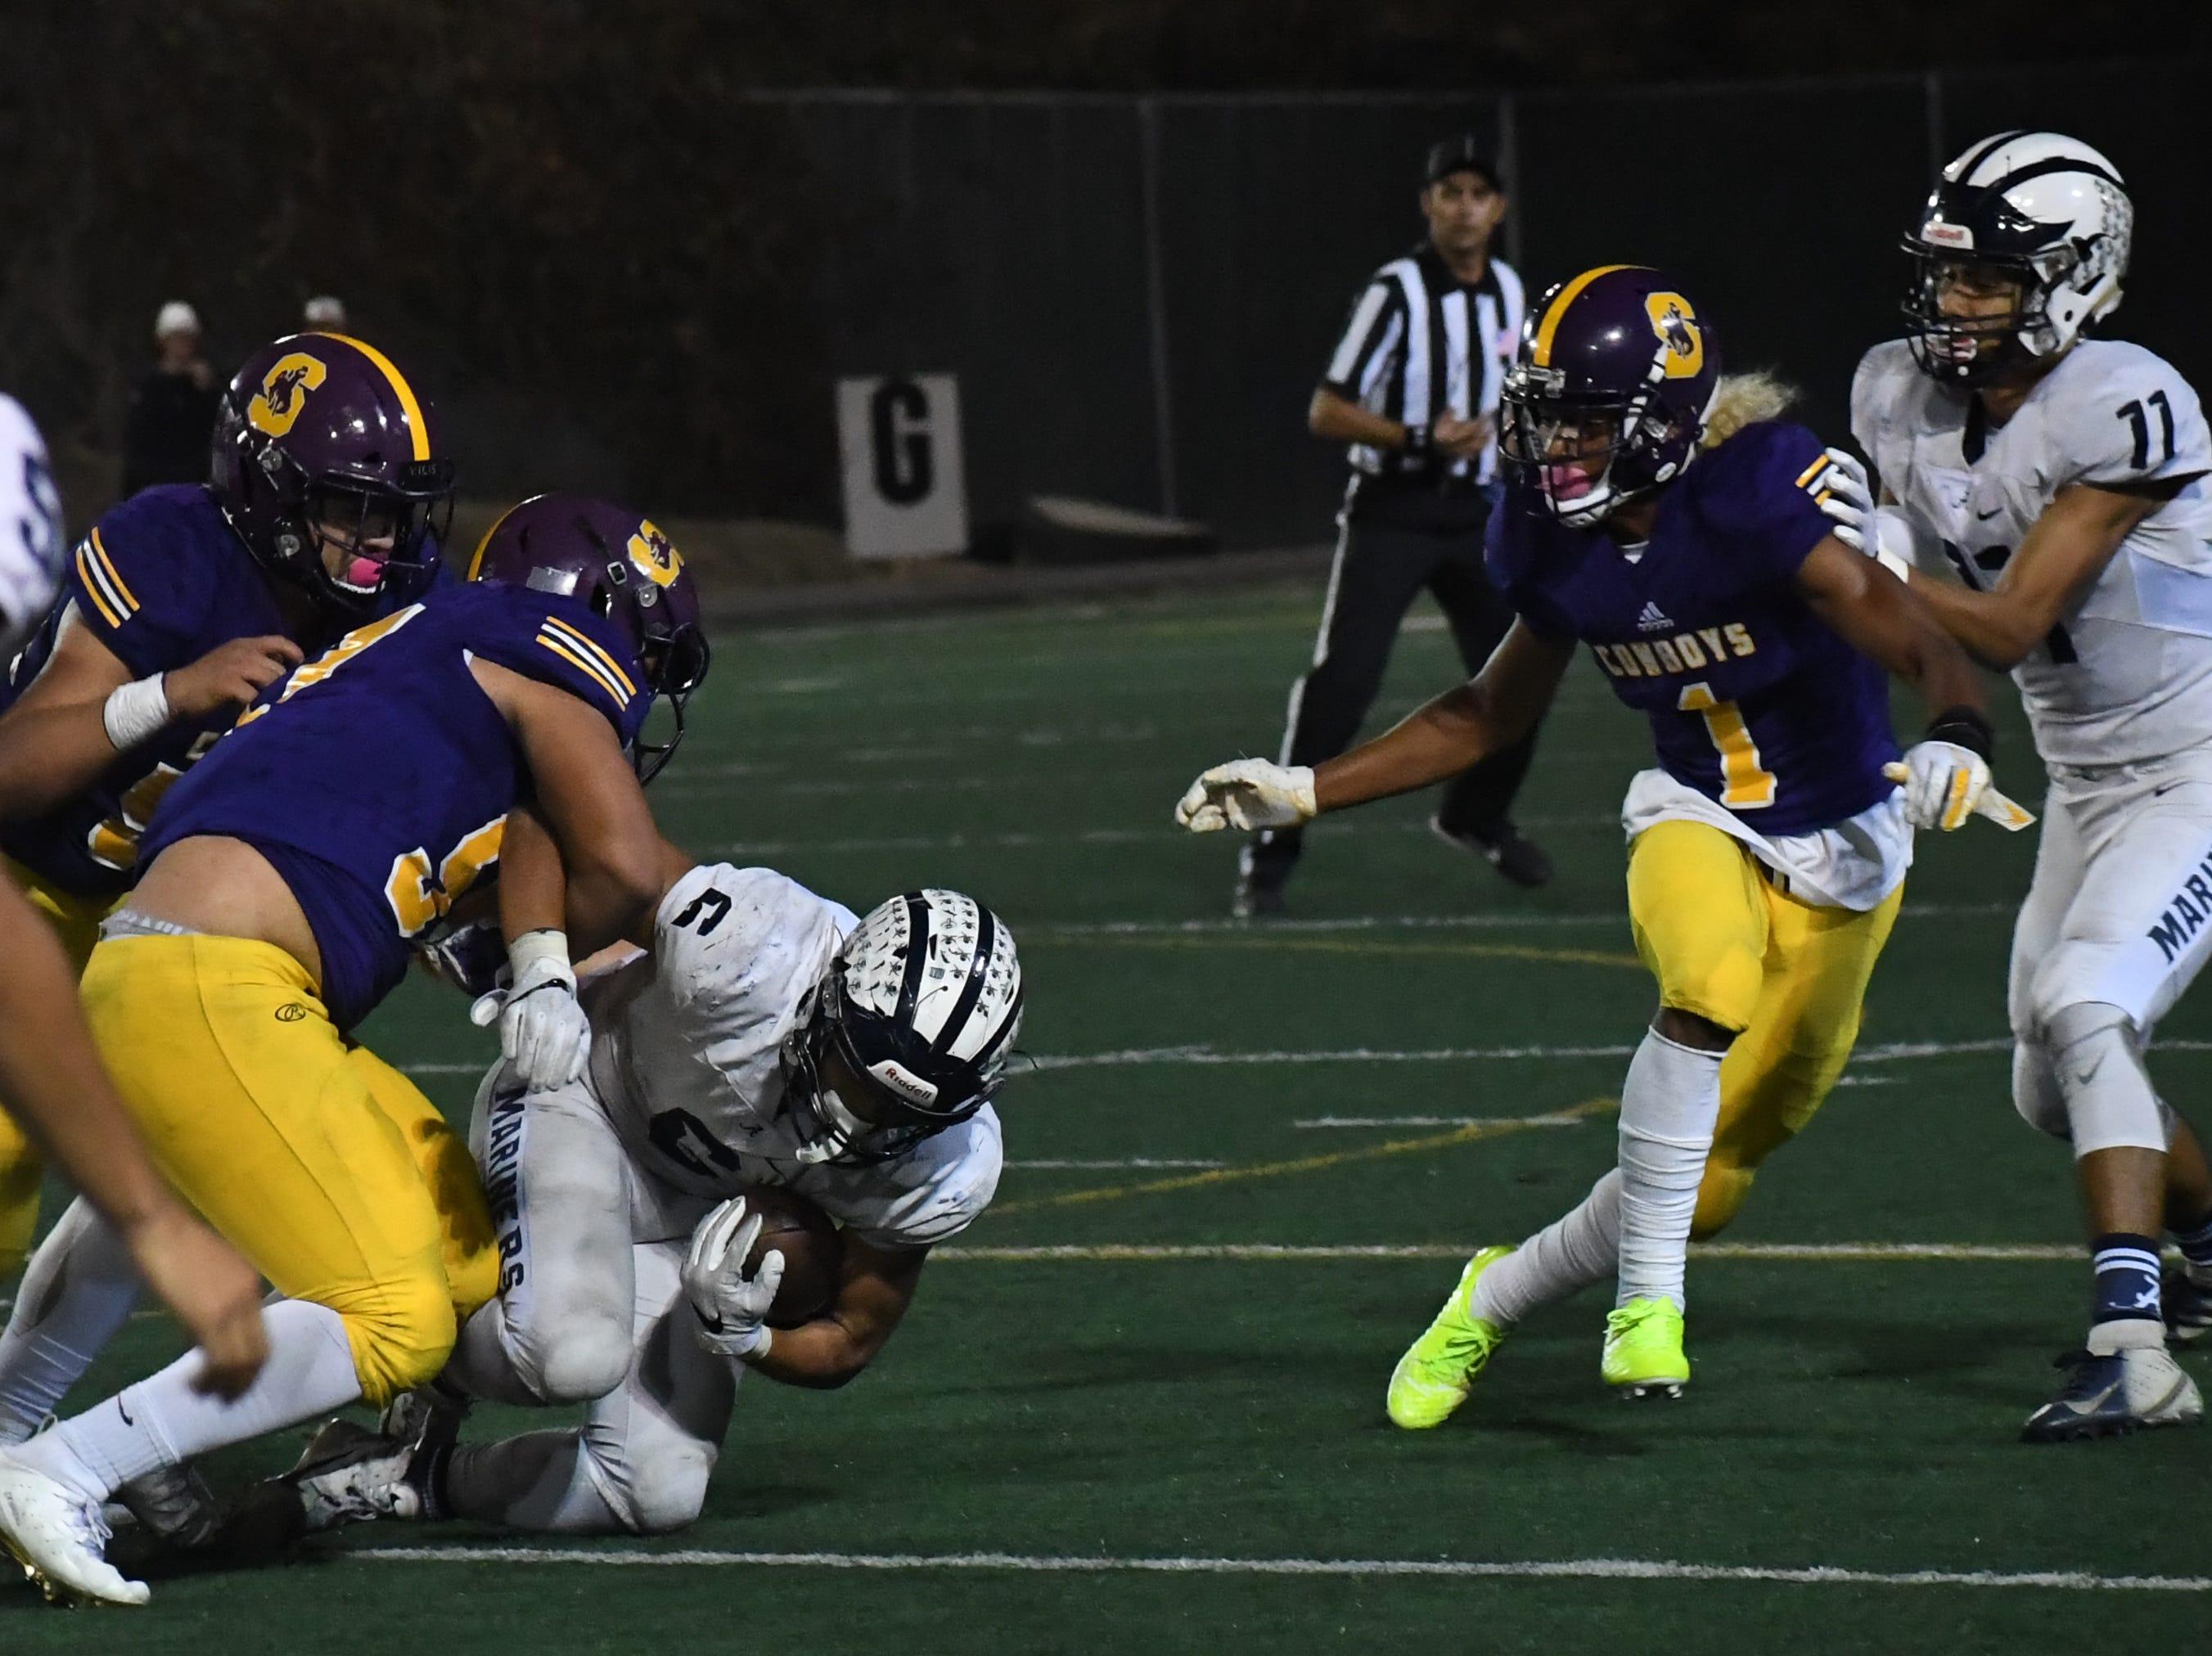 Salinas defensive lineman Sebastian Fomez (57) makes a tackle on an Aptos running back.